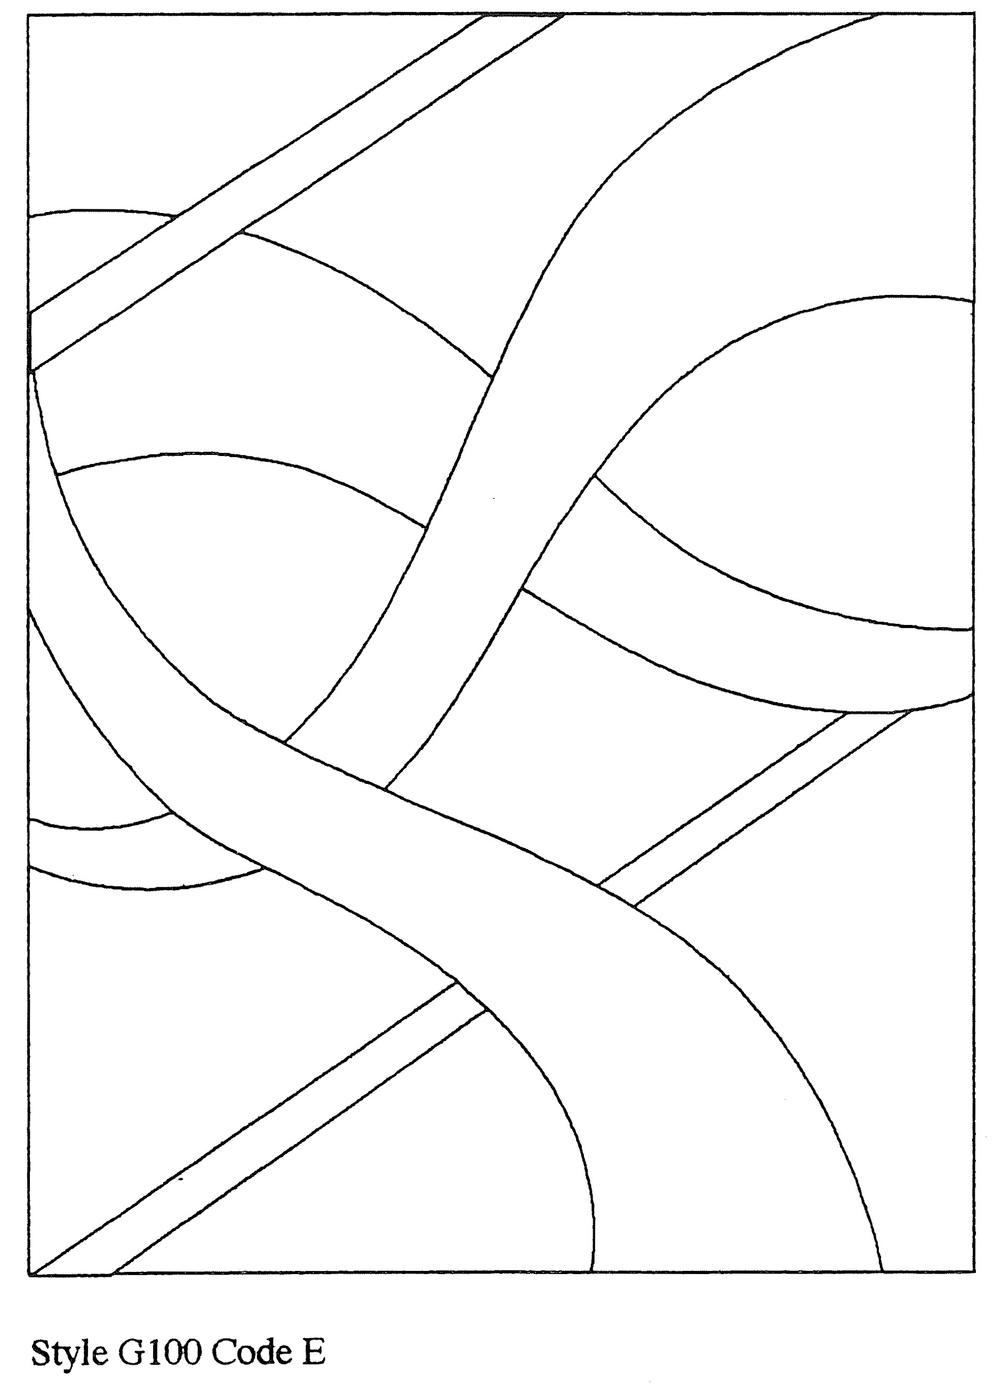 Page 1 copy 2.jpg